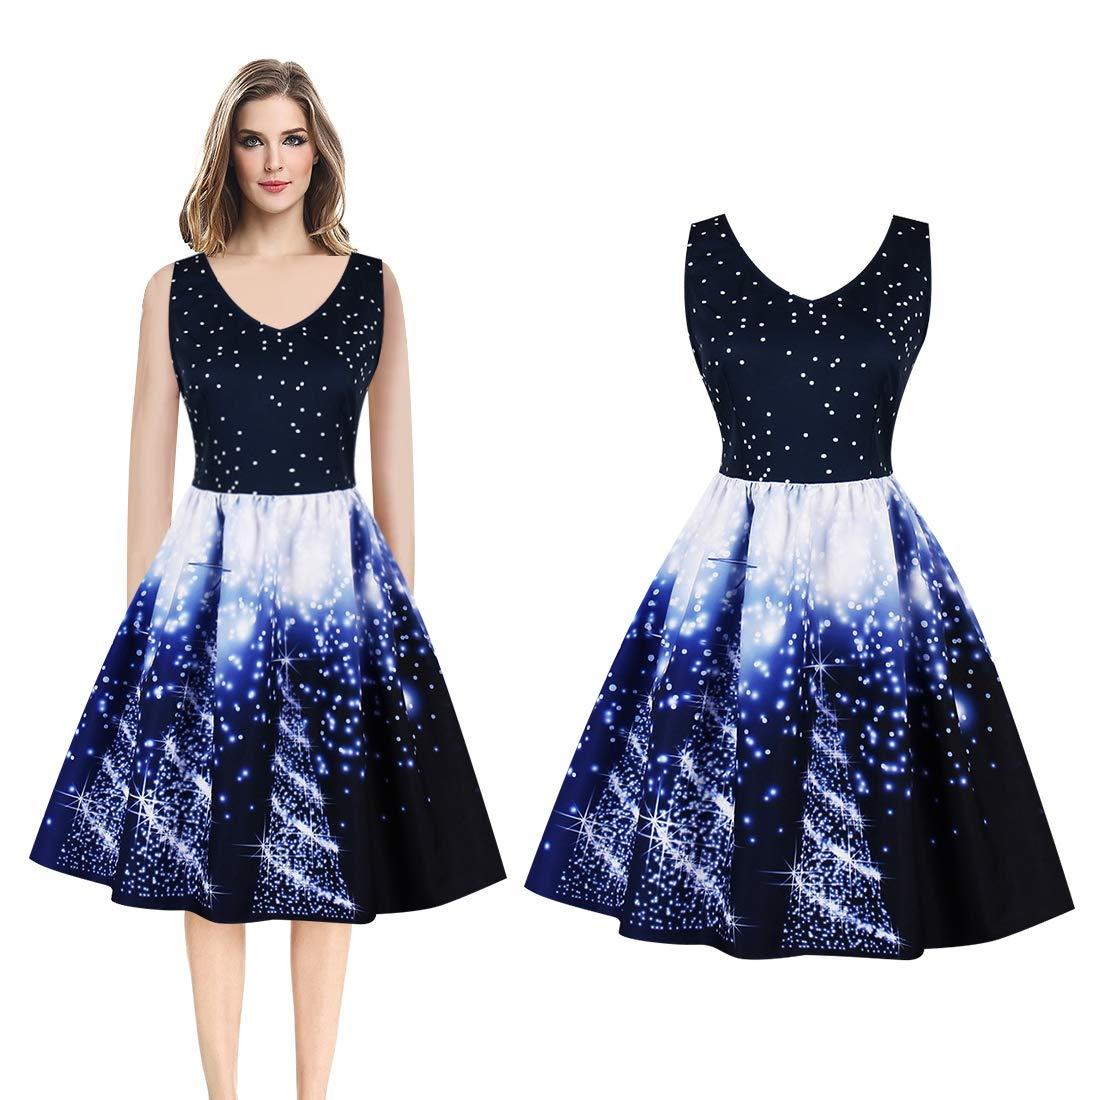 20ba65130f1b Vintage Dress, Elegant Starry Sky Printing Women V-Neck Sleeveless Empire  Waist Pleated Dress at Amazon Women's Clothing store: